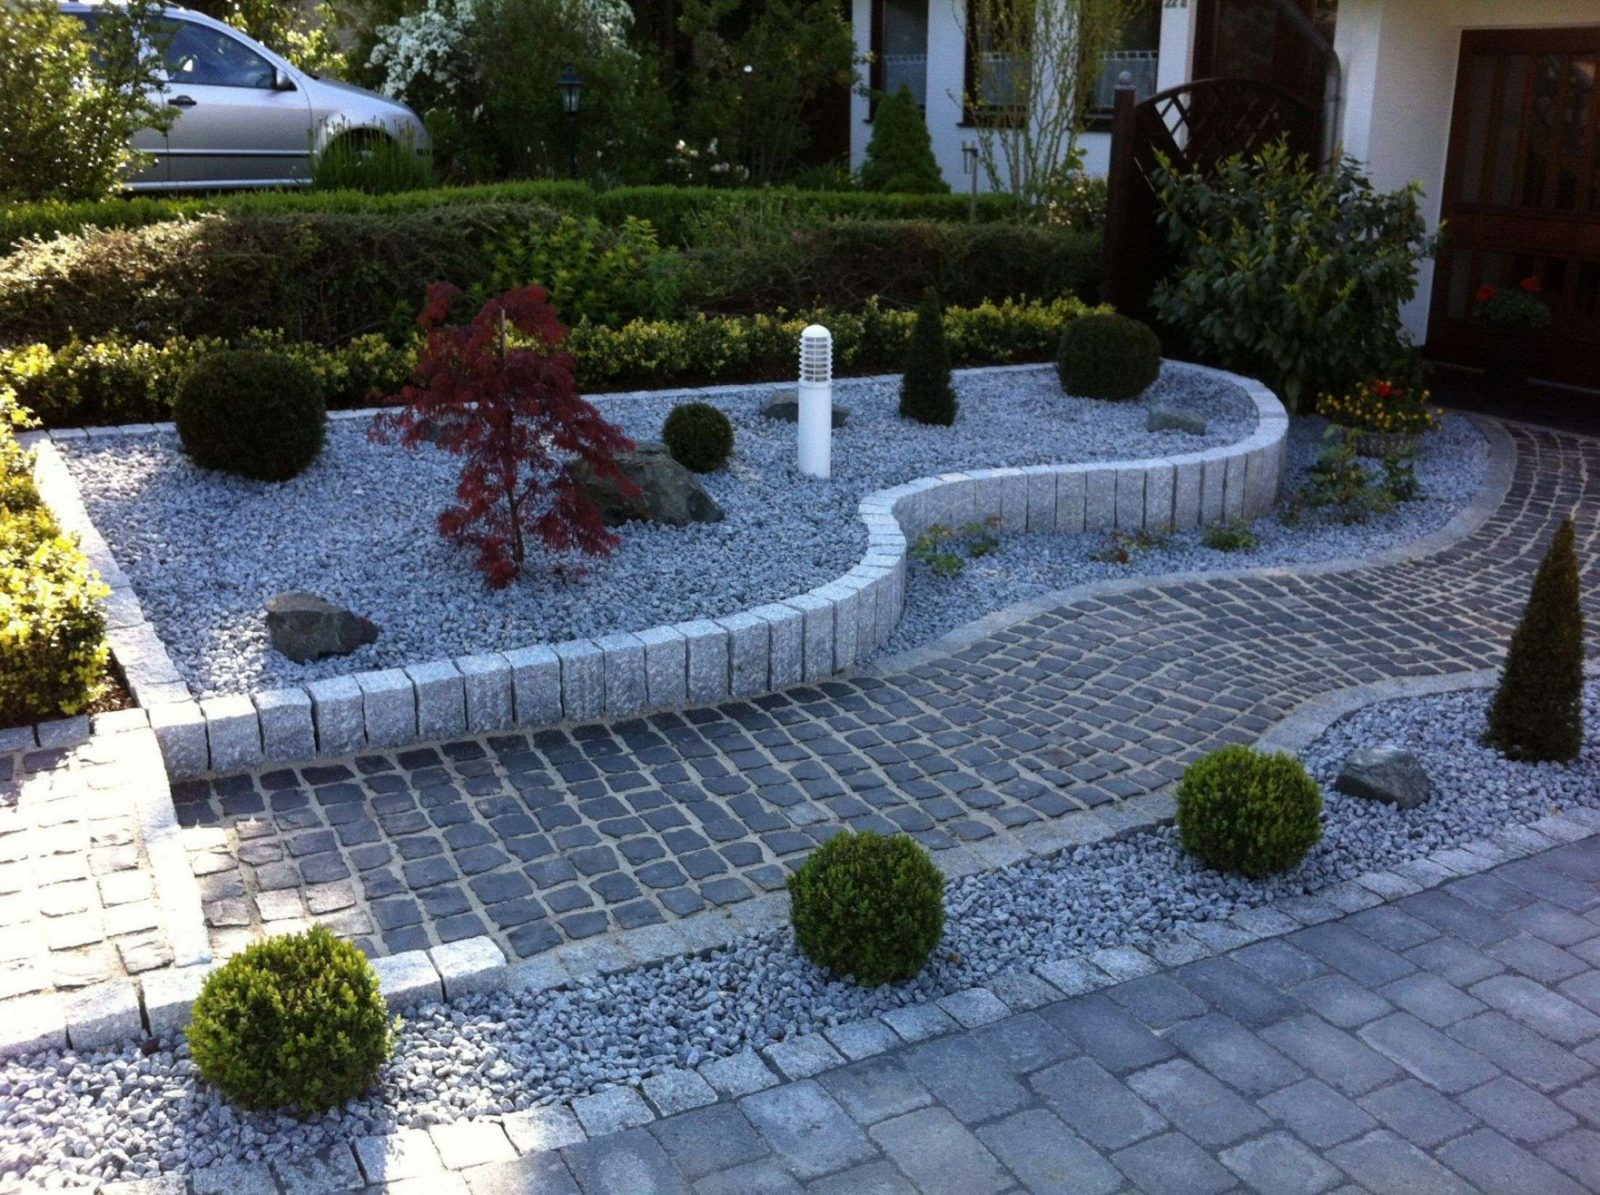 Garten Mit Kies Gestalten Bilder Designideen Von Blumenrabatte von Beet Mit Kies Gestalten Bild